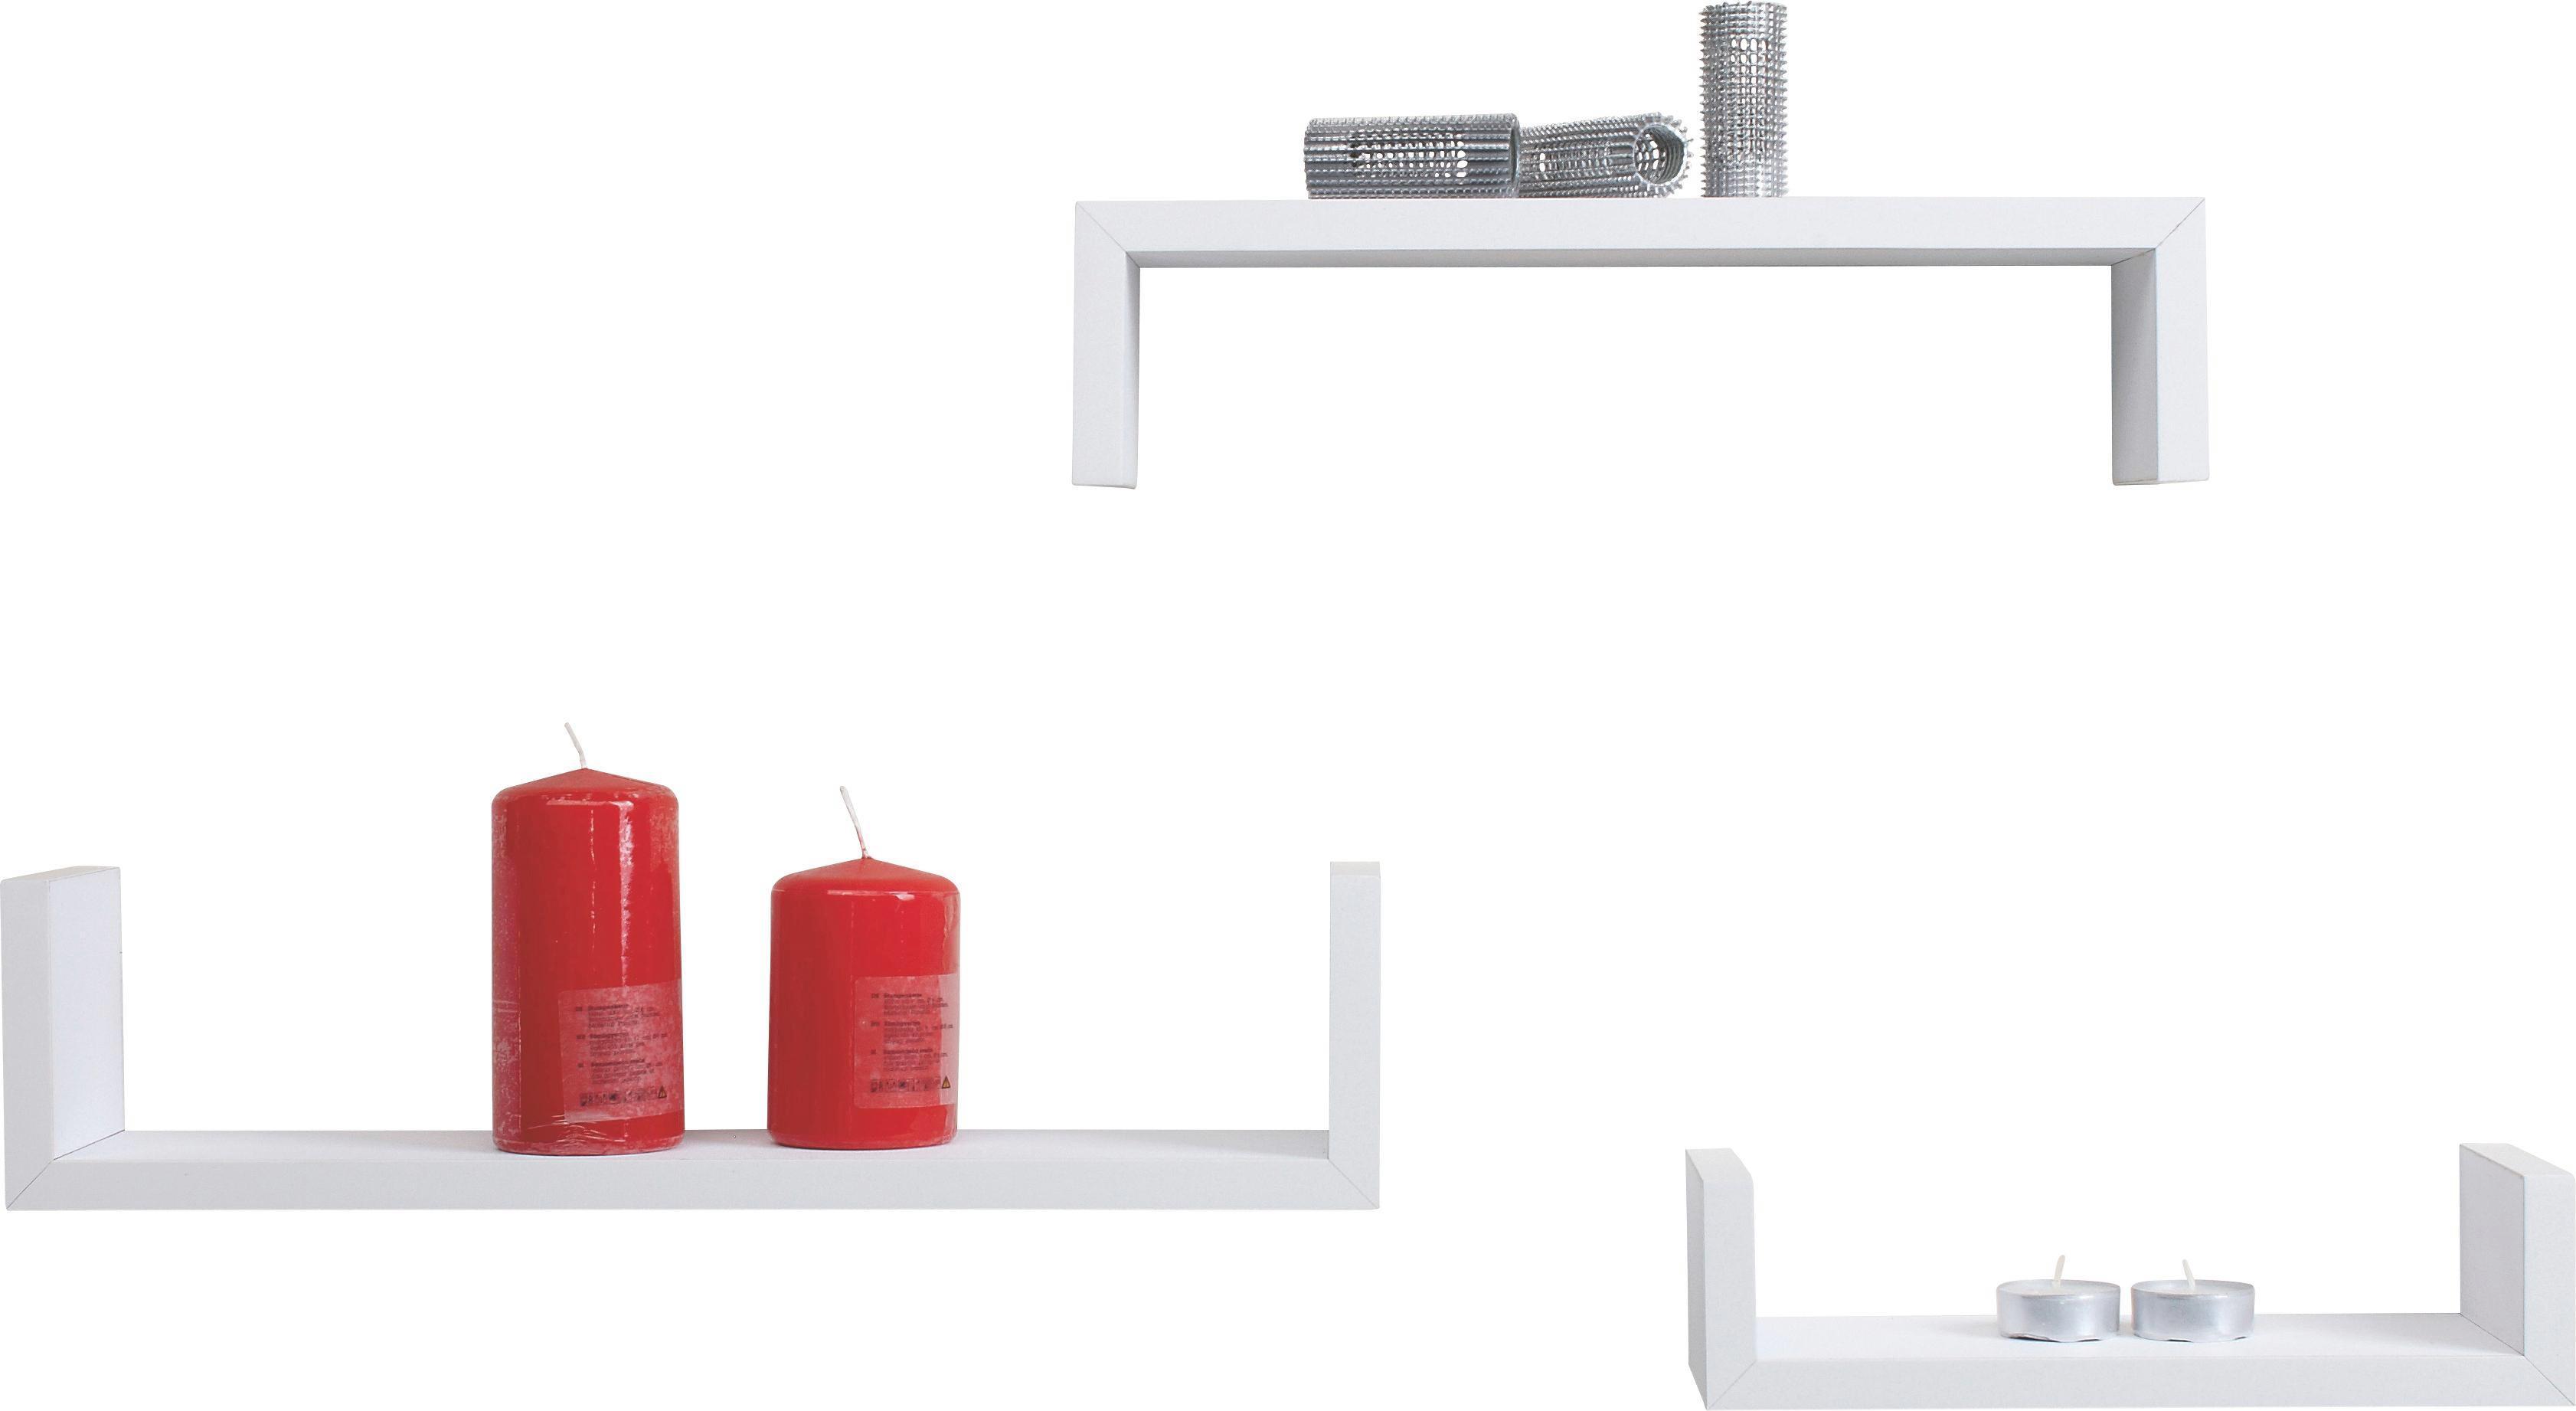 Wandboardset U-bord Weiß - Weiß, MODERN, Holzwerkstoff (42/10/10cm) - MÖMAX modern living